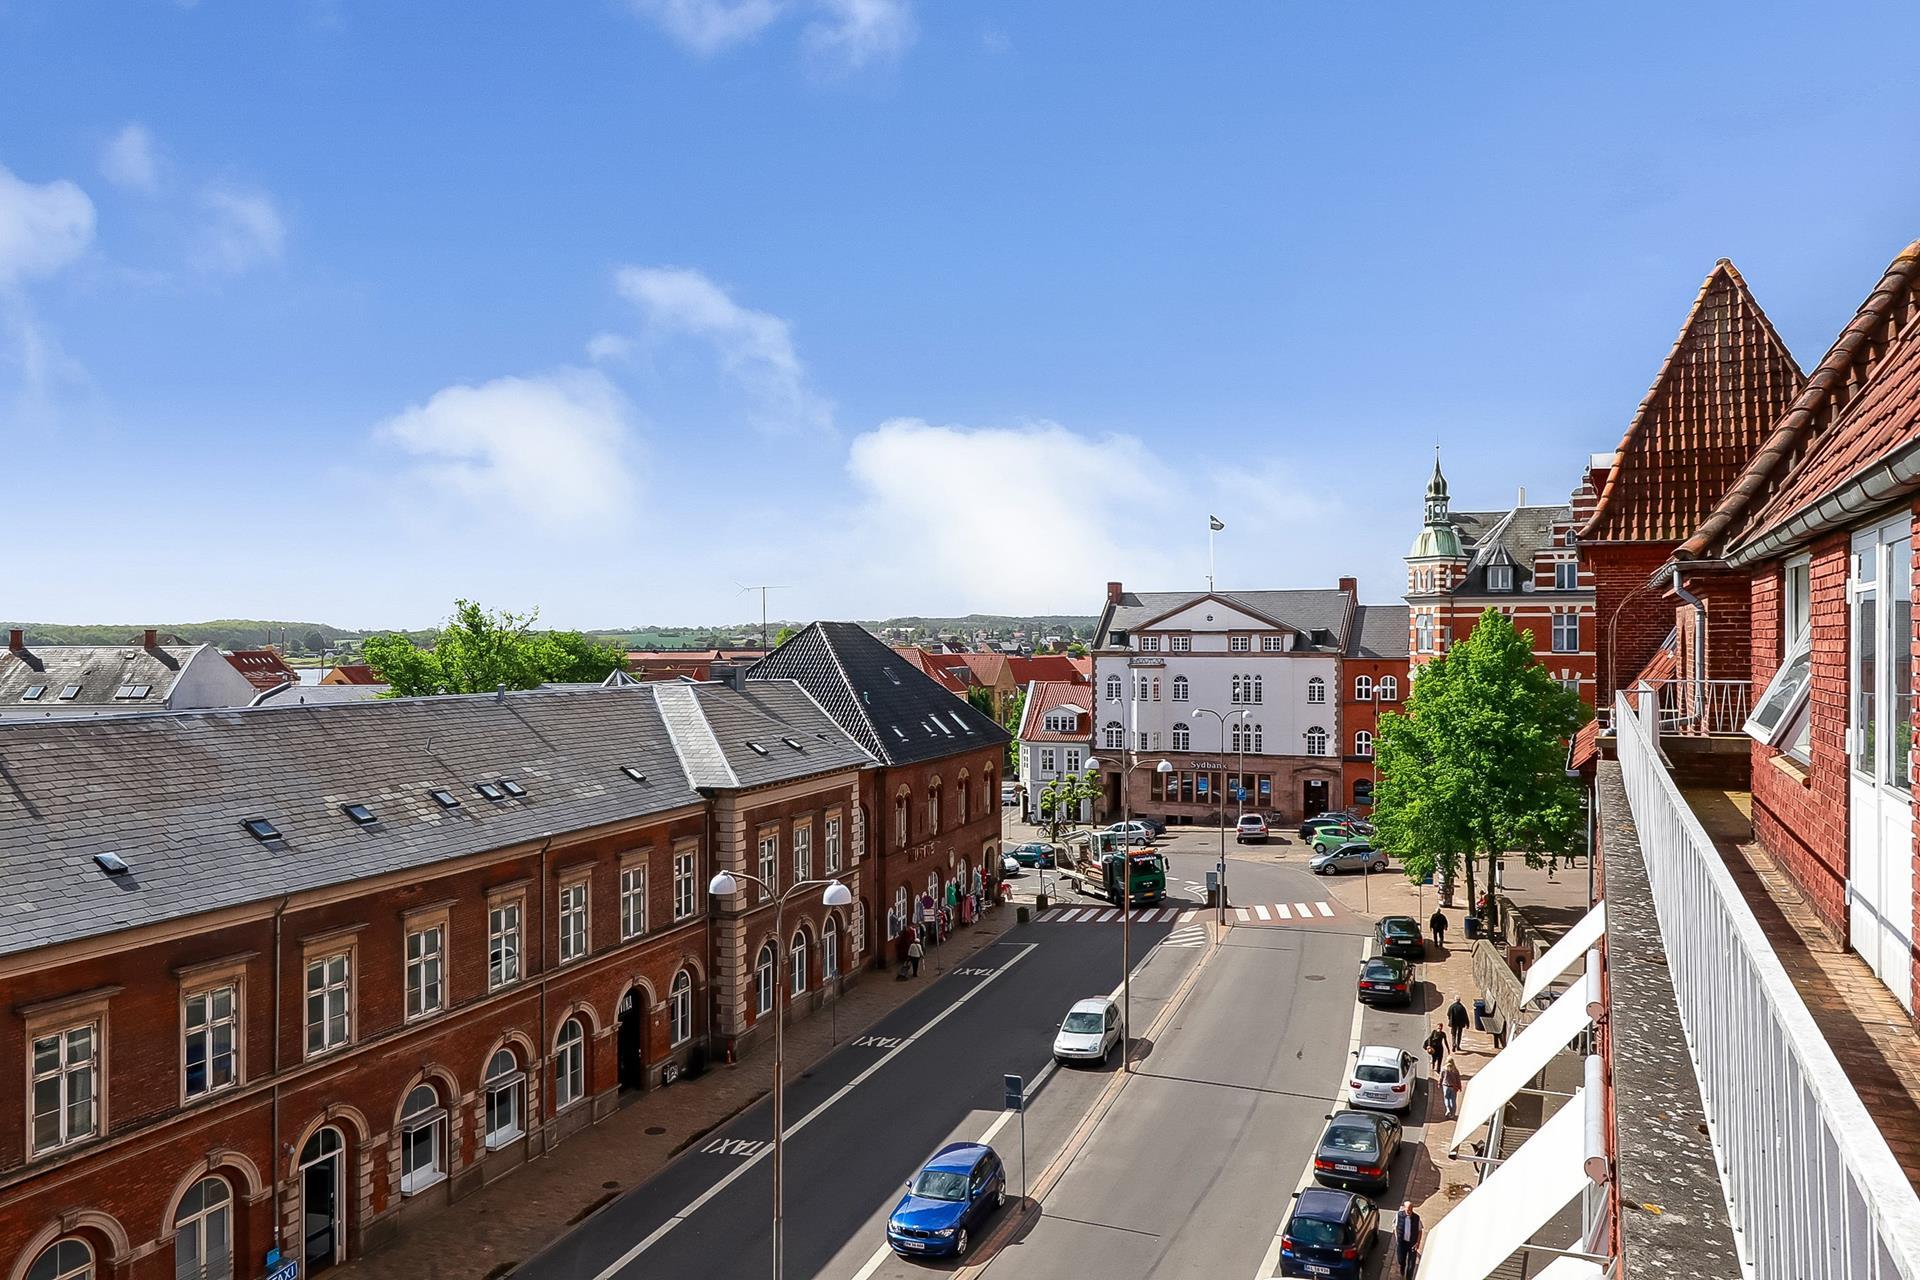 Bolig/erhverv på Klosterplads i Svendborg - Område